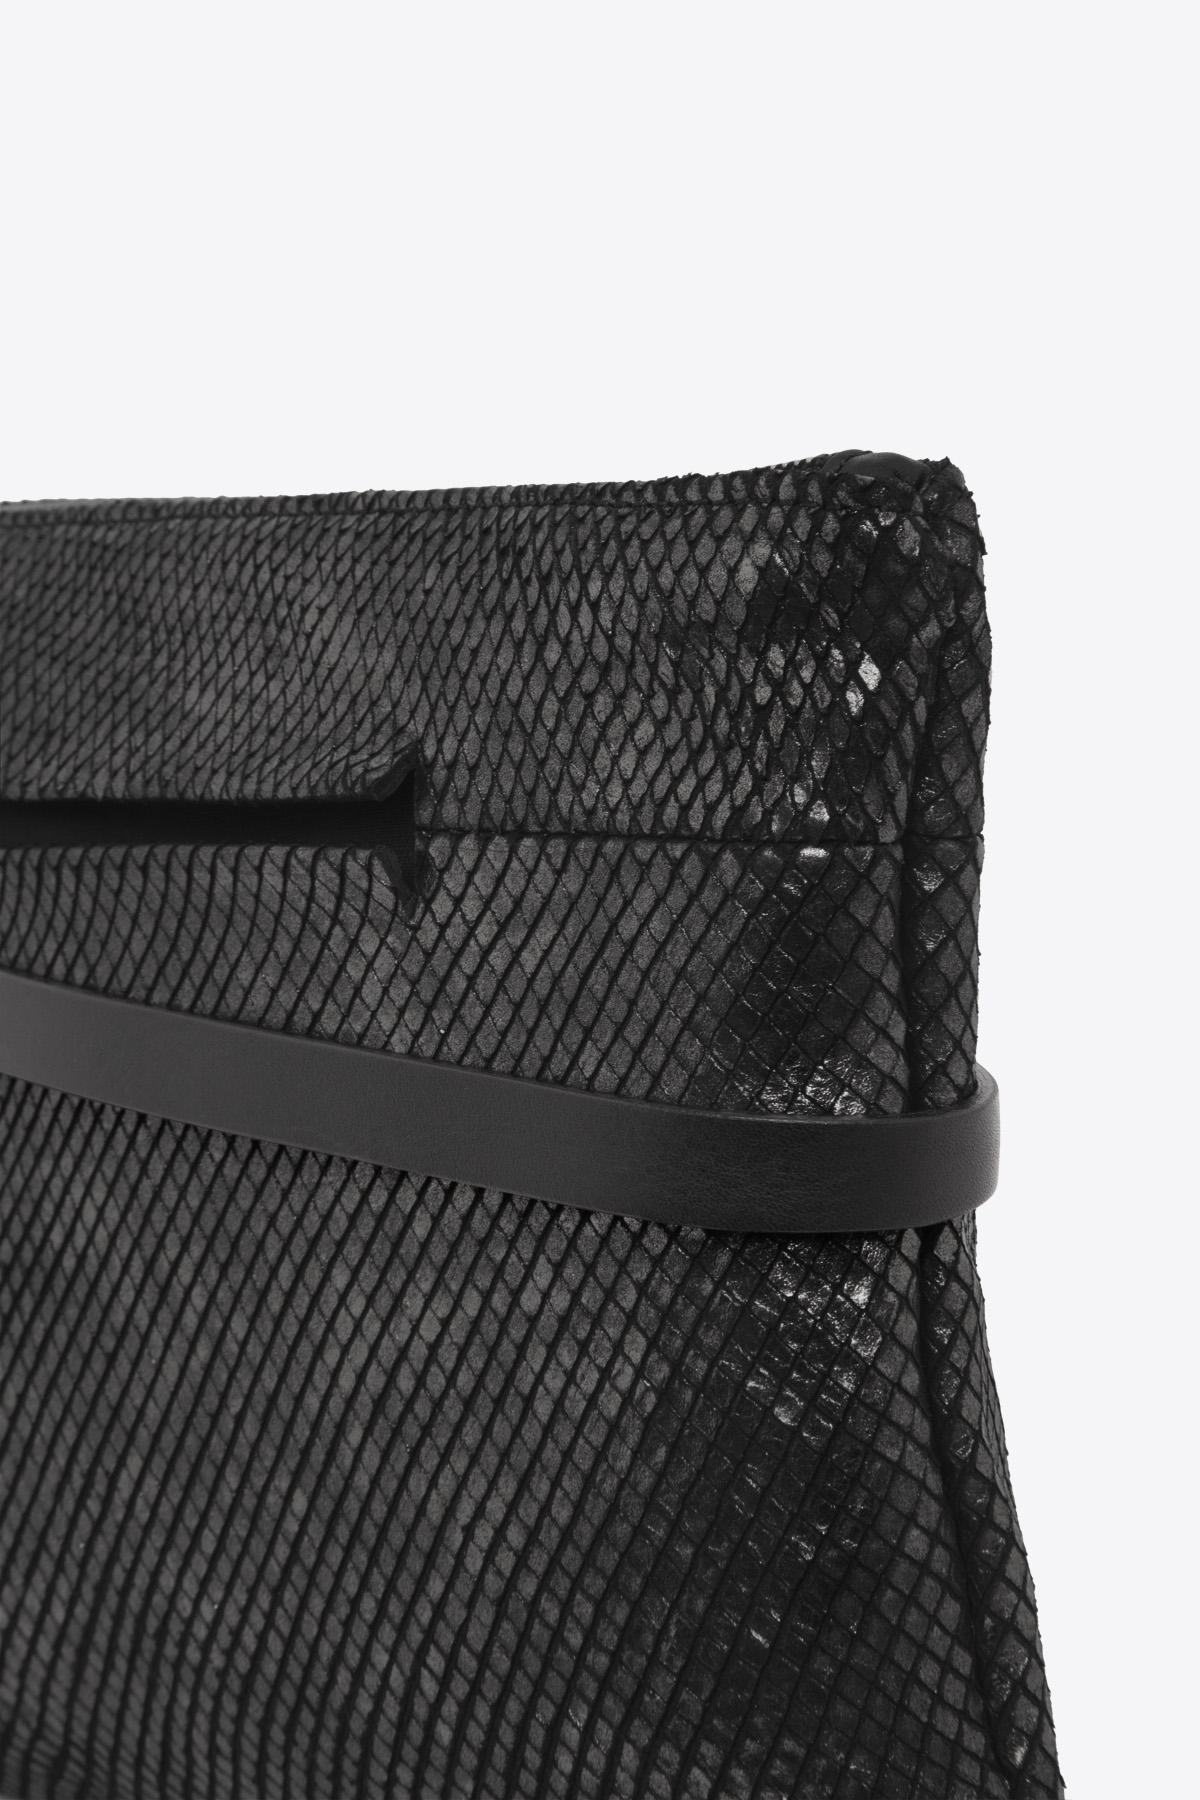 dclr004l-tapeclutch-a23-backsnakeblack-detail